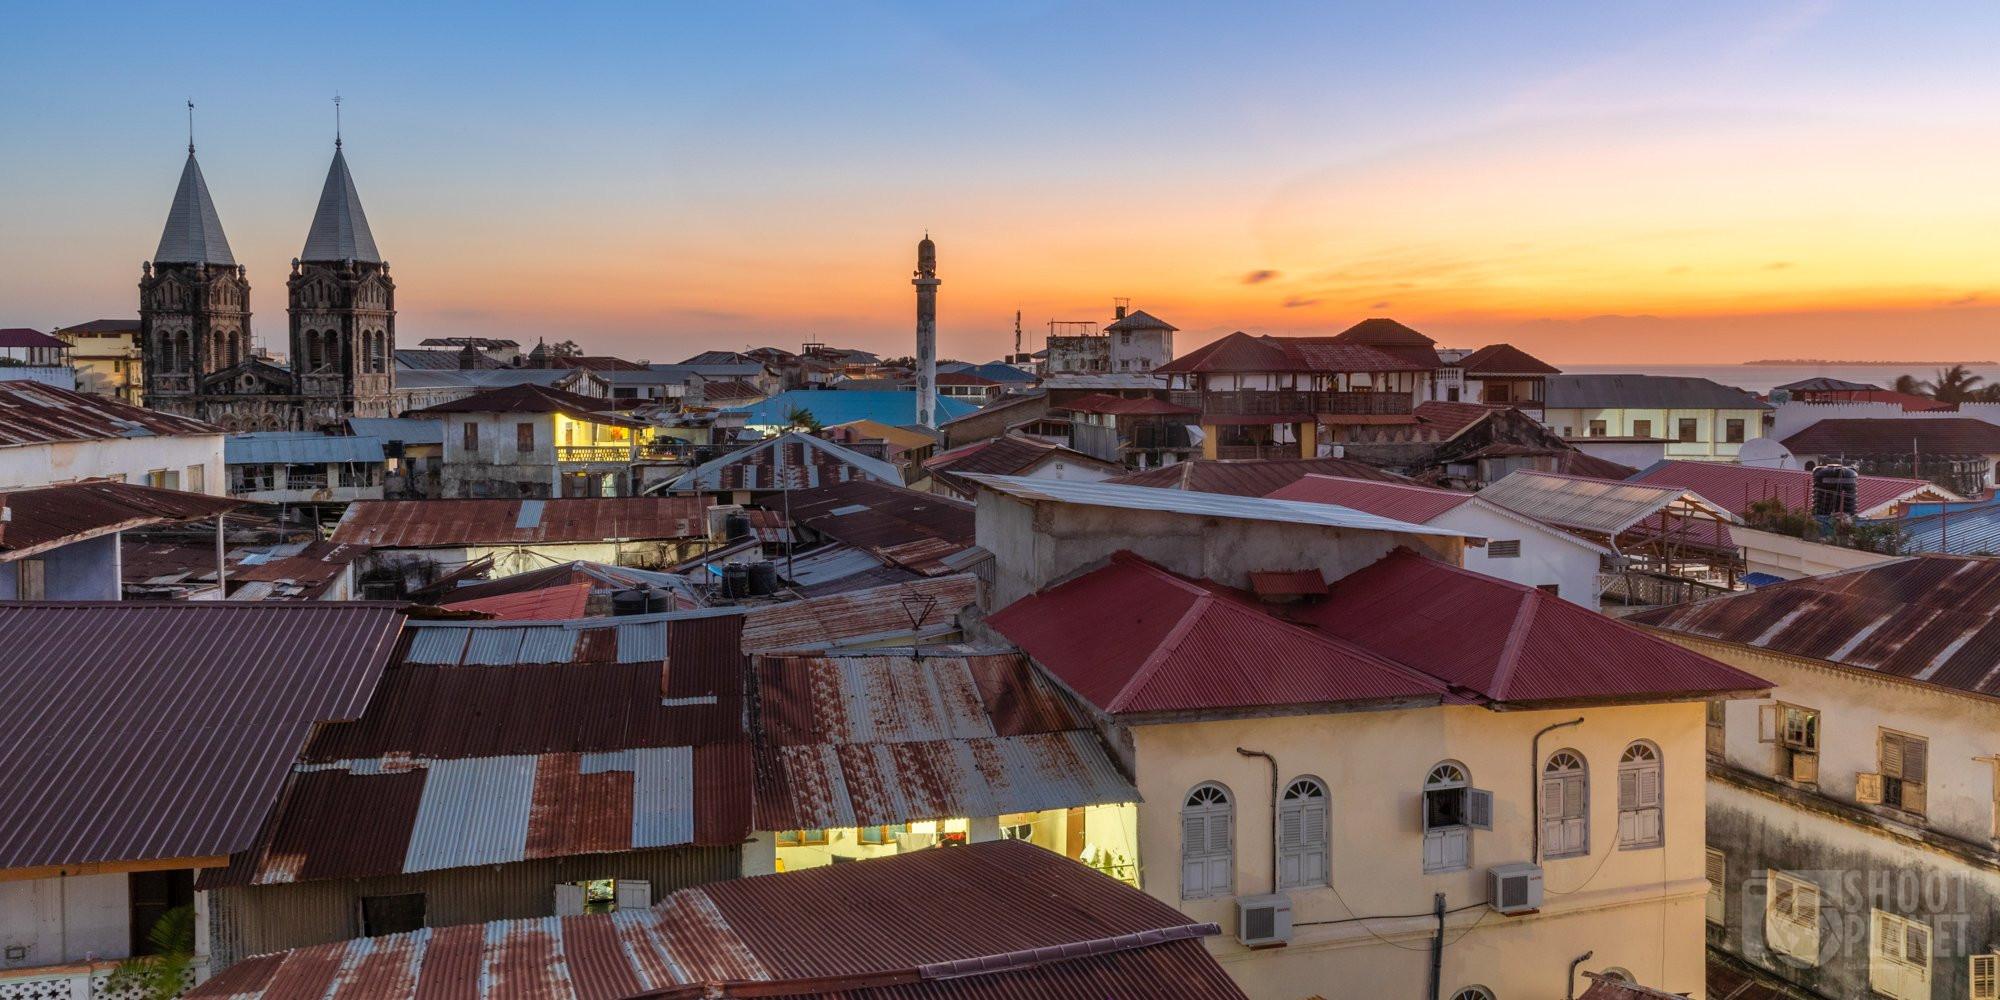 Stone town sunset skyline Zanzibar city, Tanzania